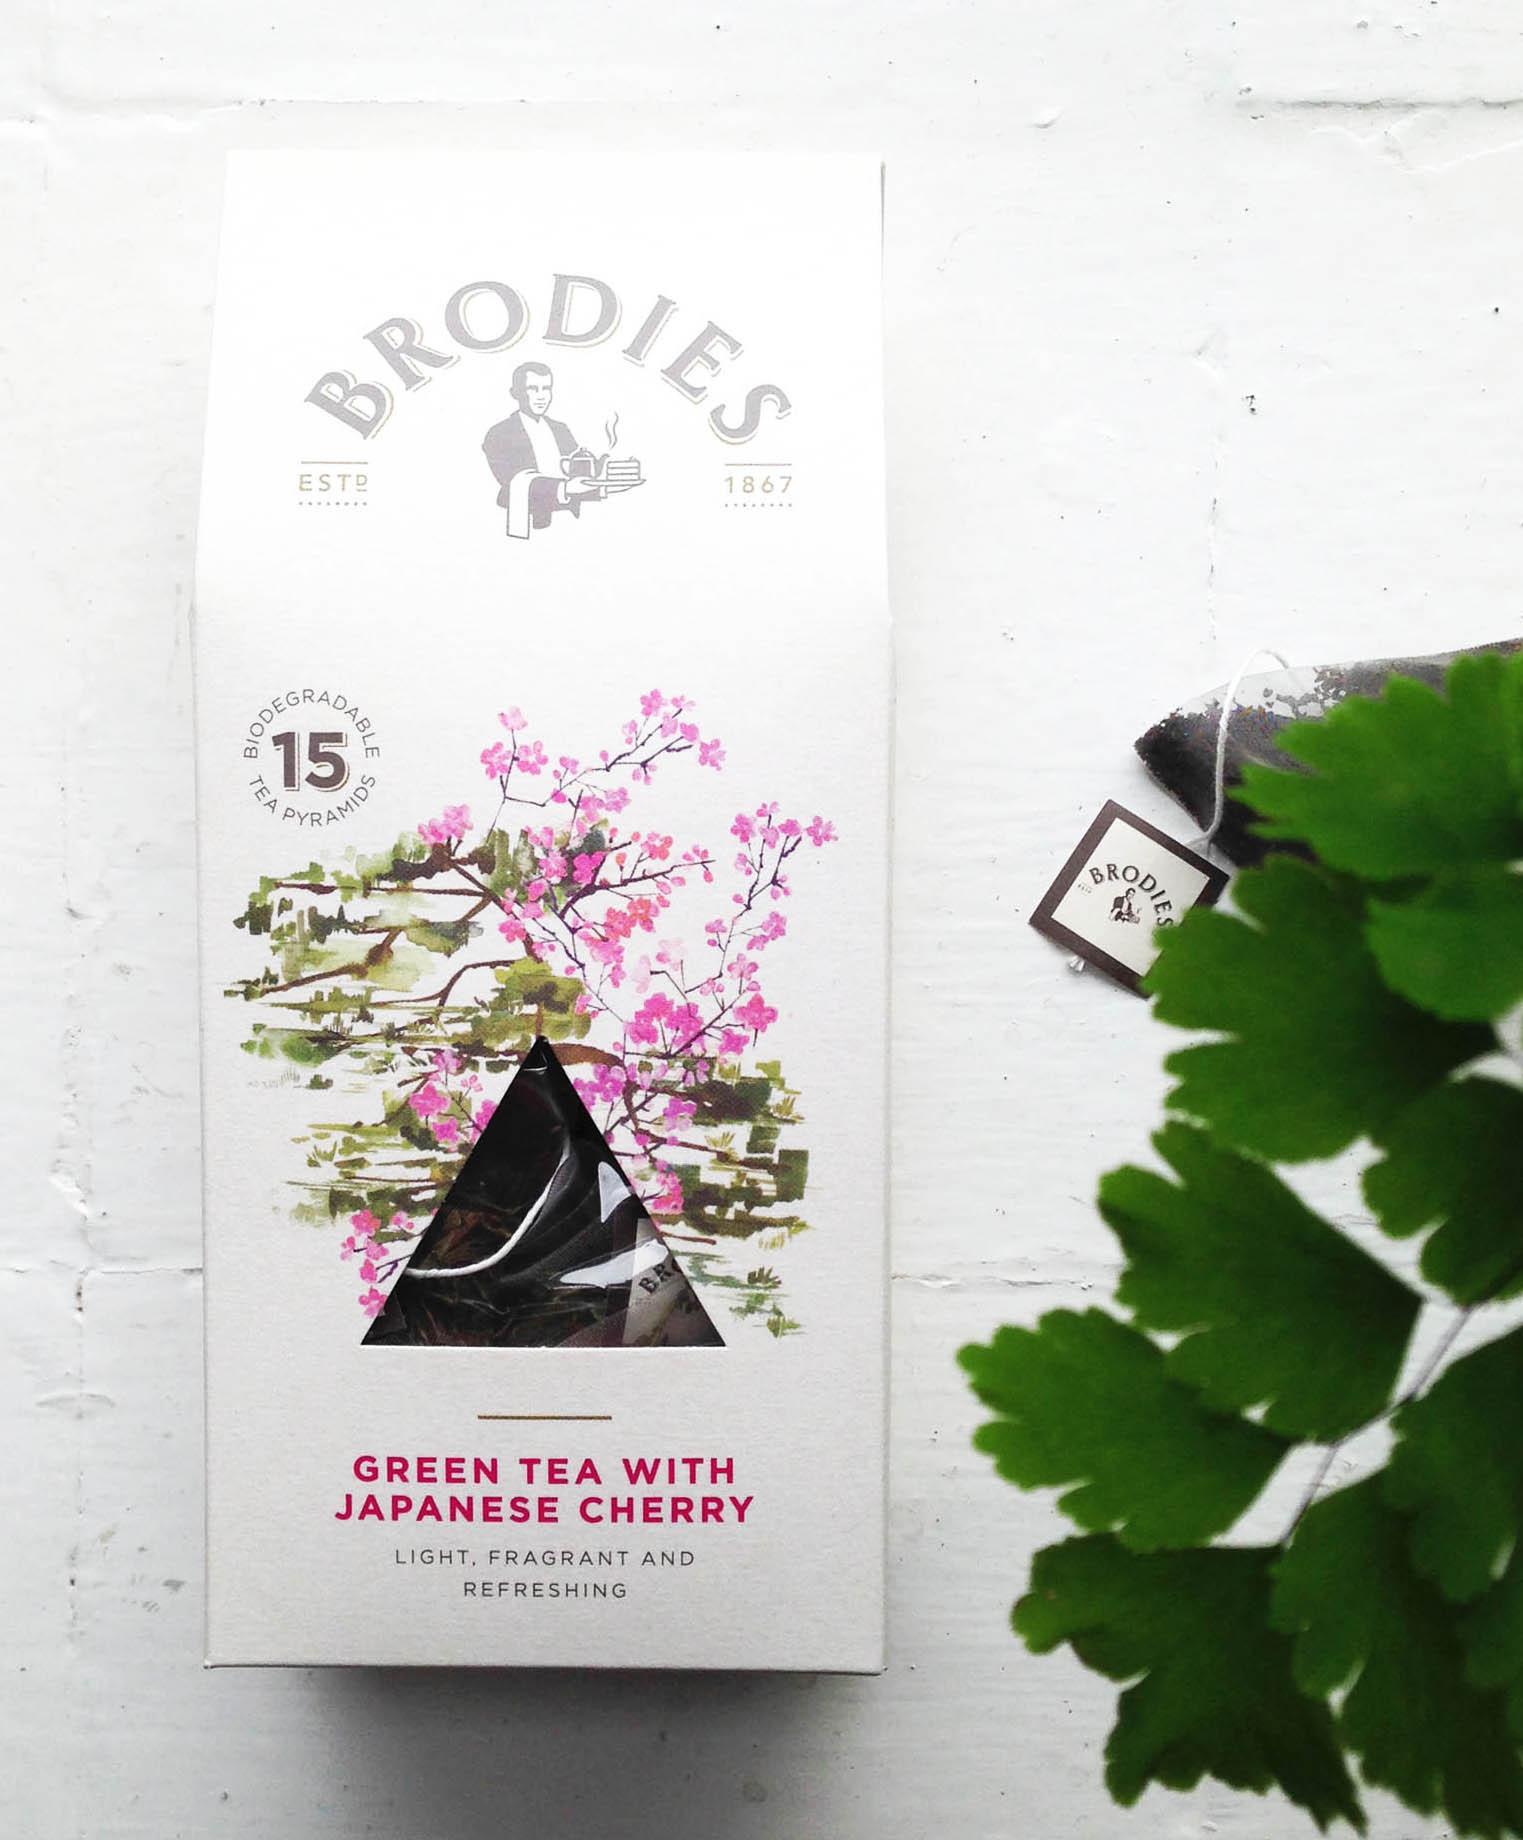 Green tea with japanese cherry - H.Sharpe for web.jpg